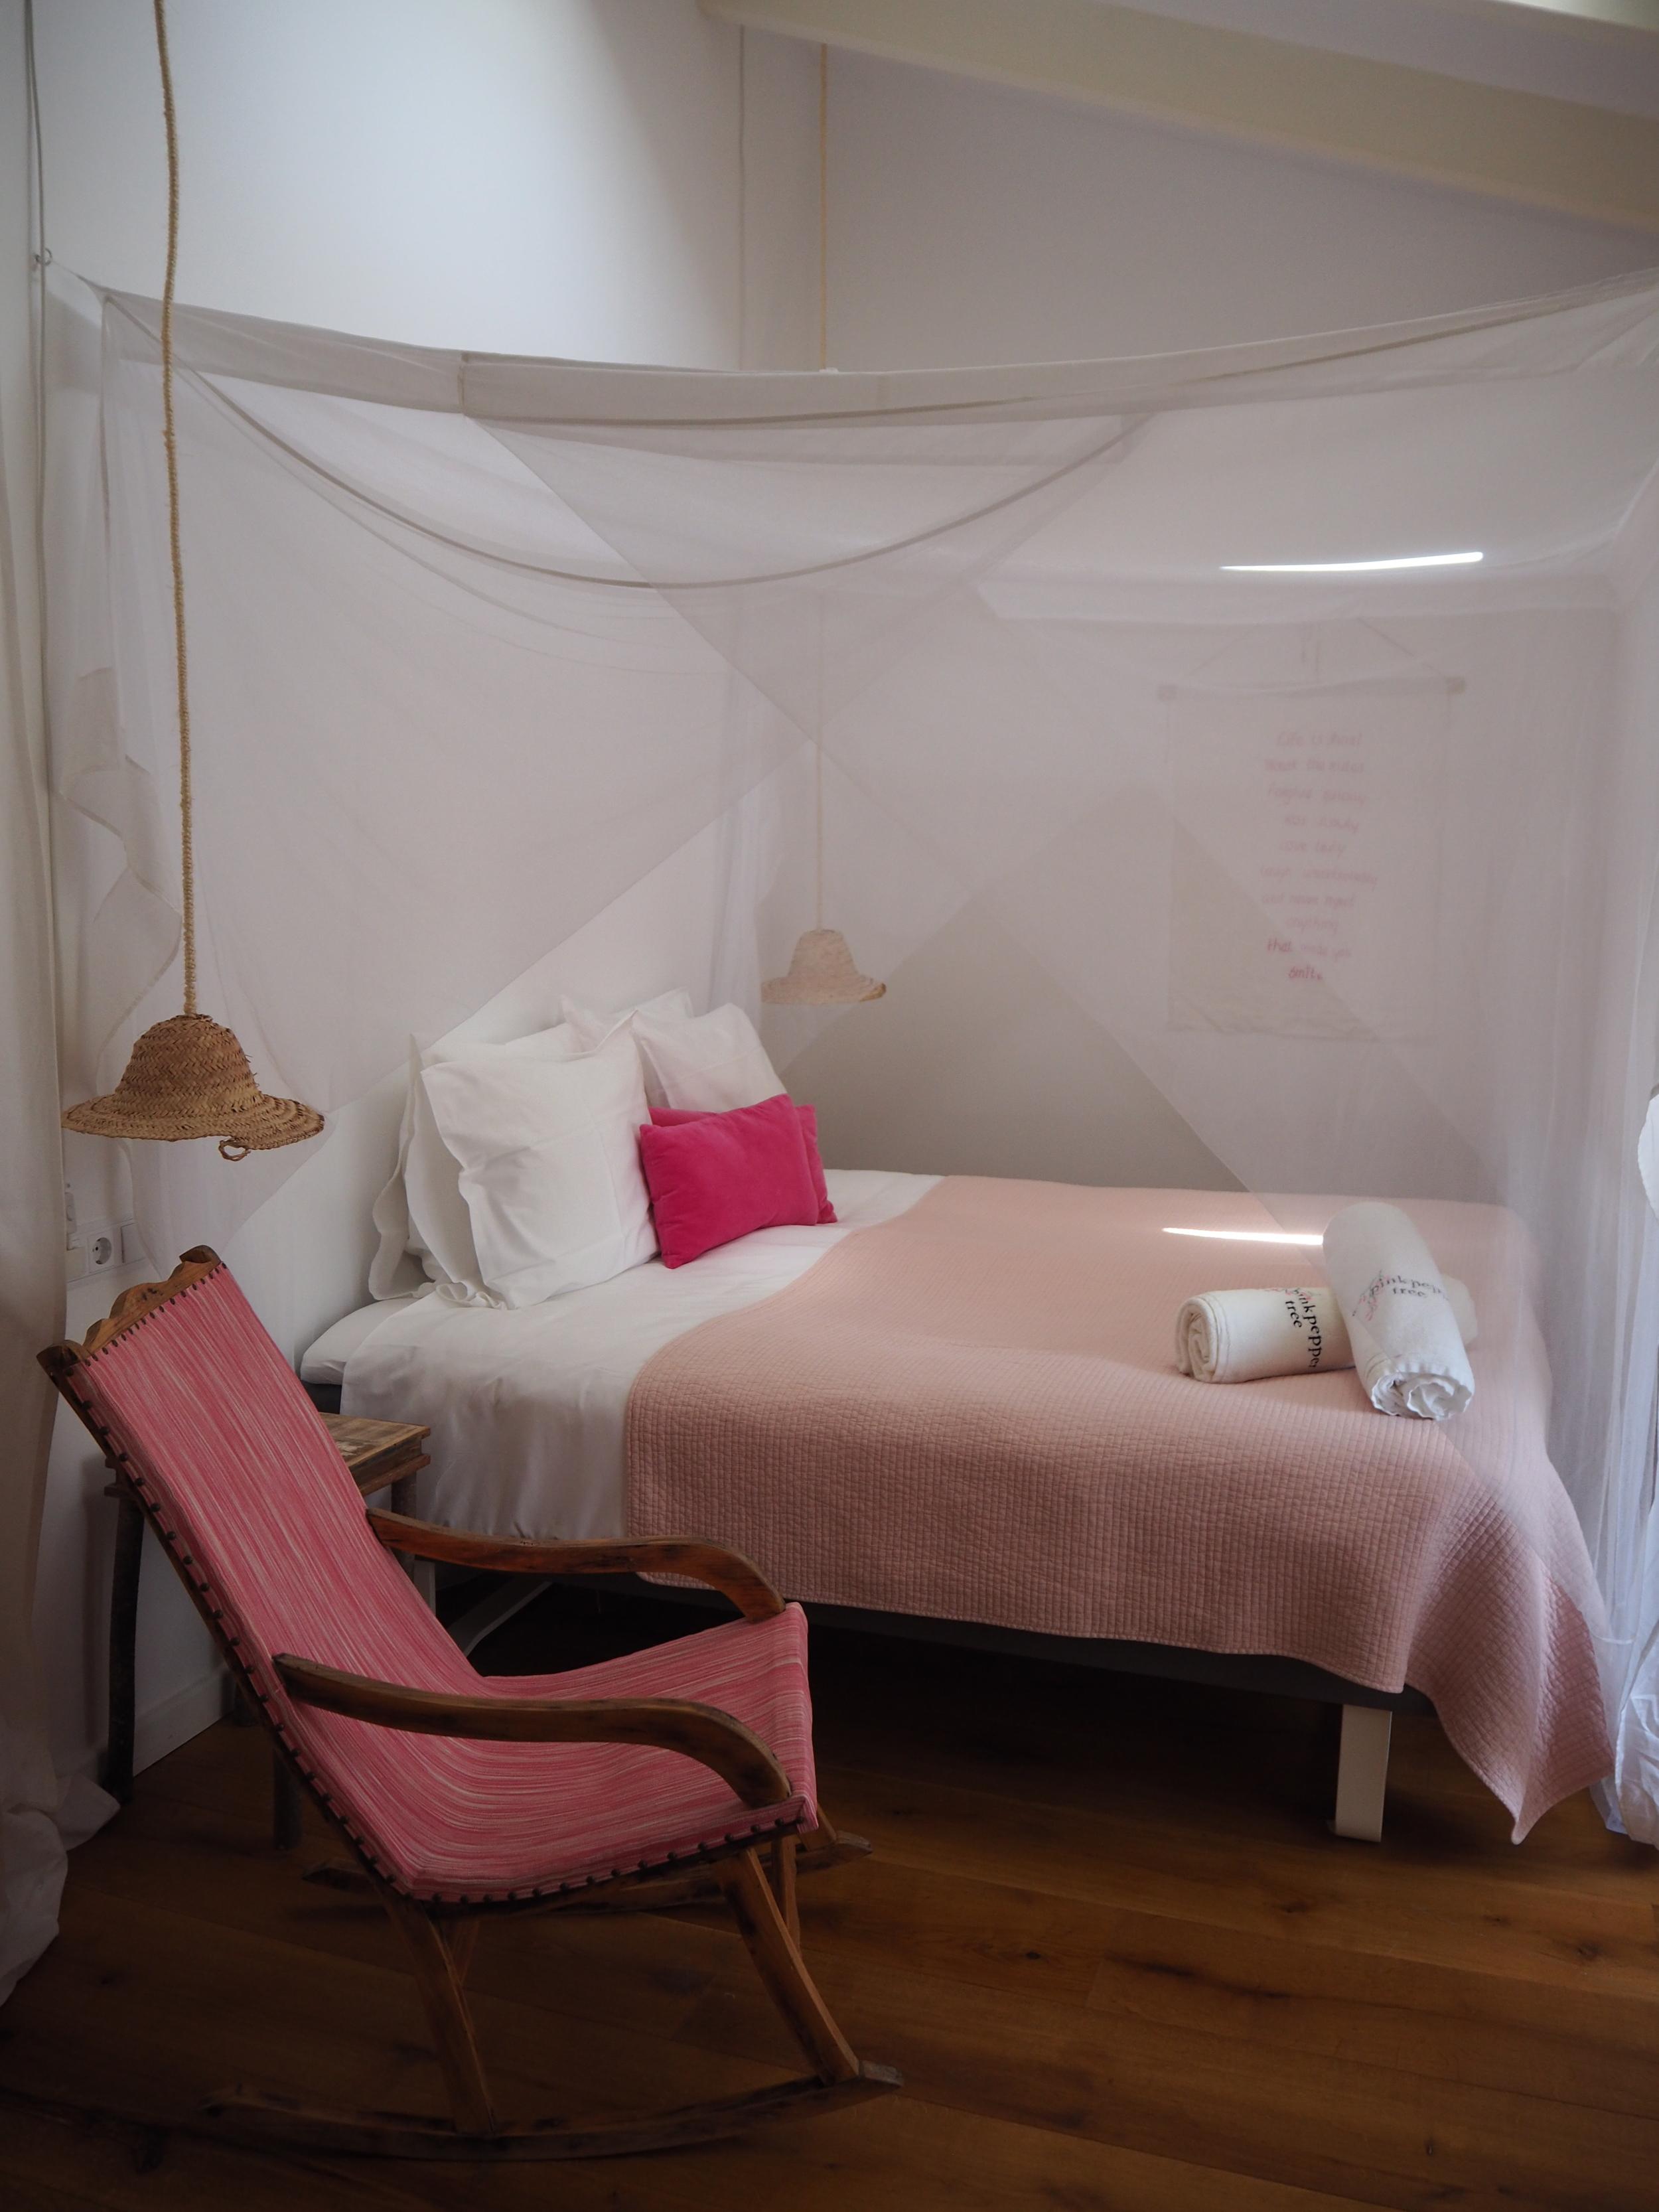 Mosquito nets at The pink Pepper Tree Hotel- Lloseta, Majoraca. A traditional Majorcan finca.